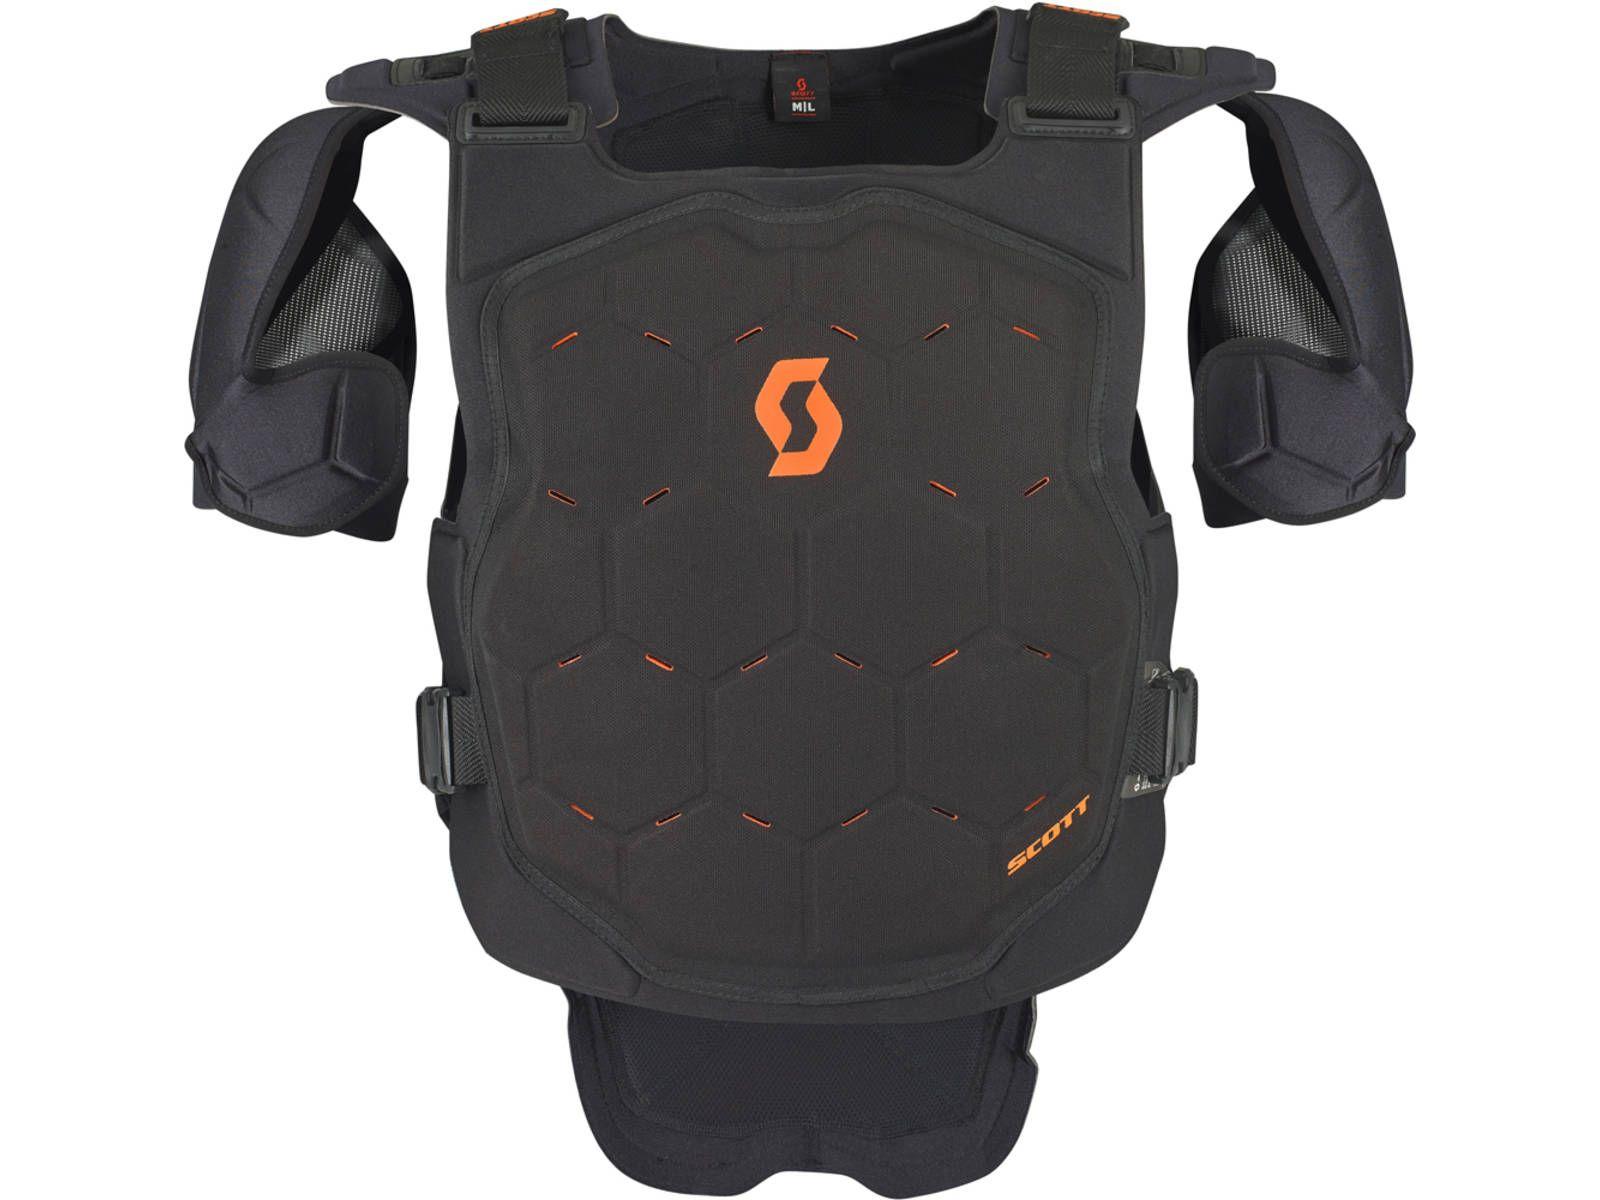 MTB Bike Motorrad Ski Scott Softcon 2 Body Armor Protector - 2020 (S, M/L)